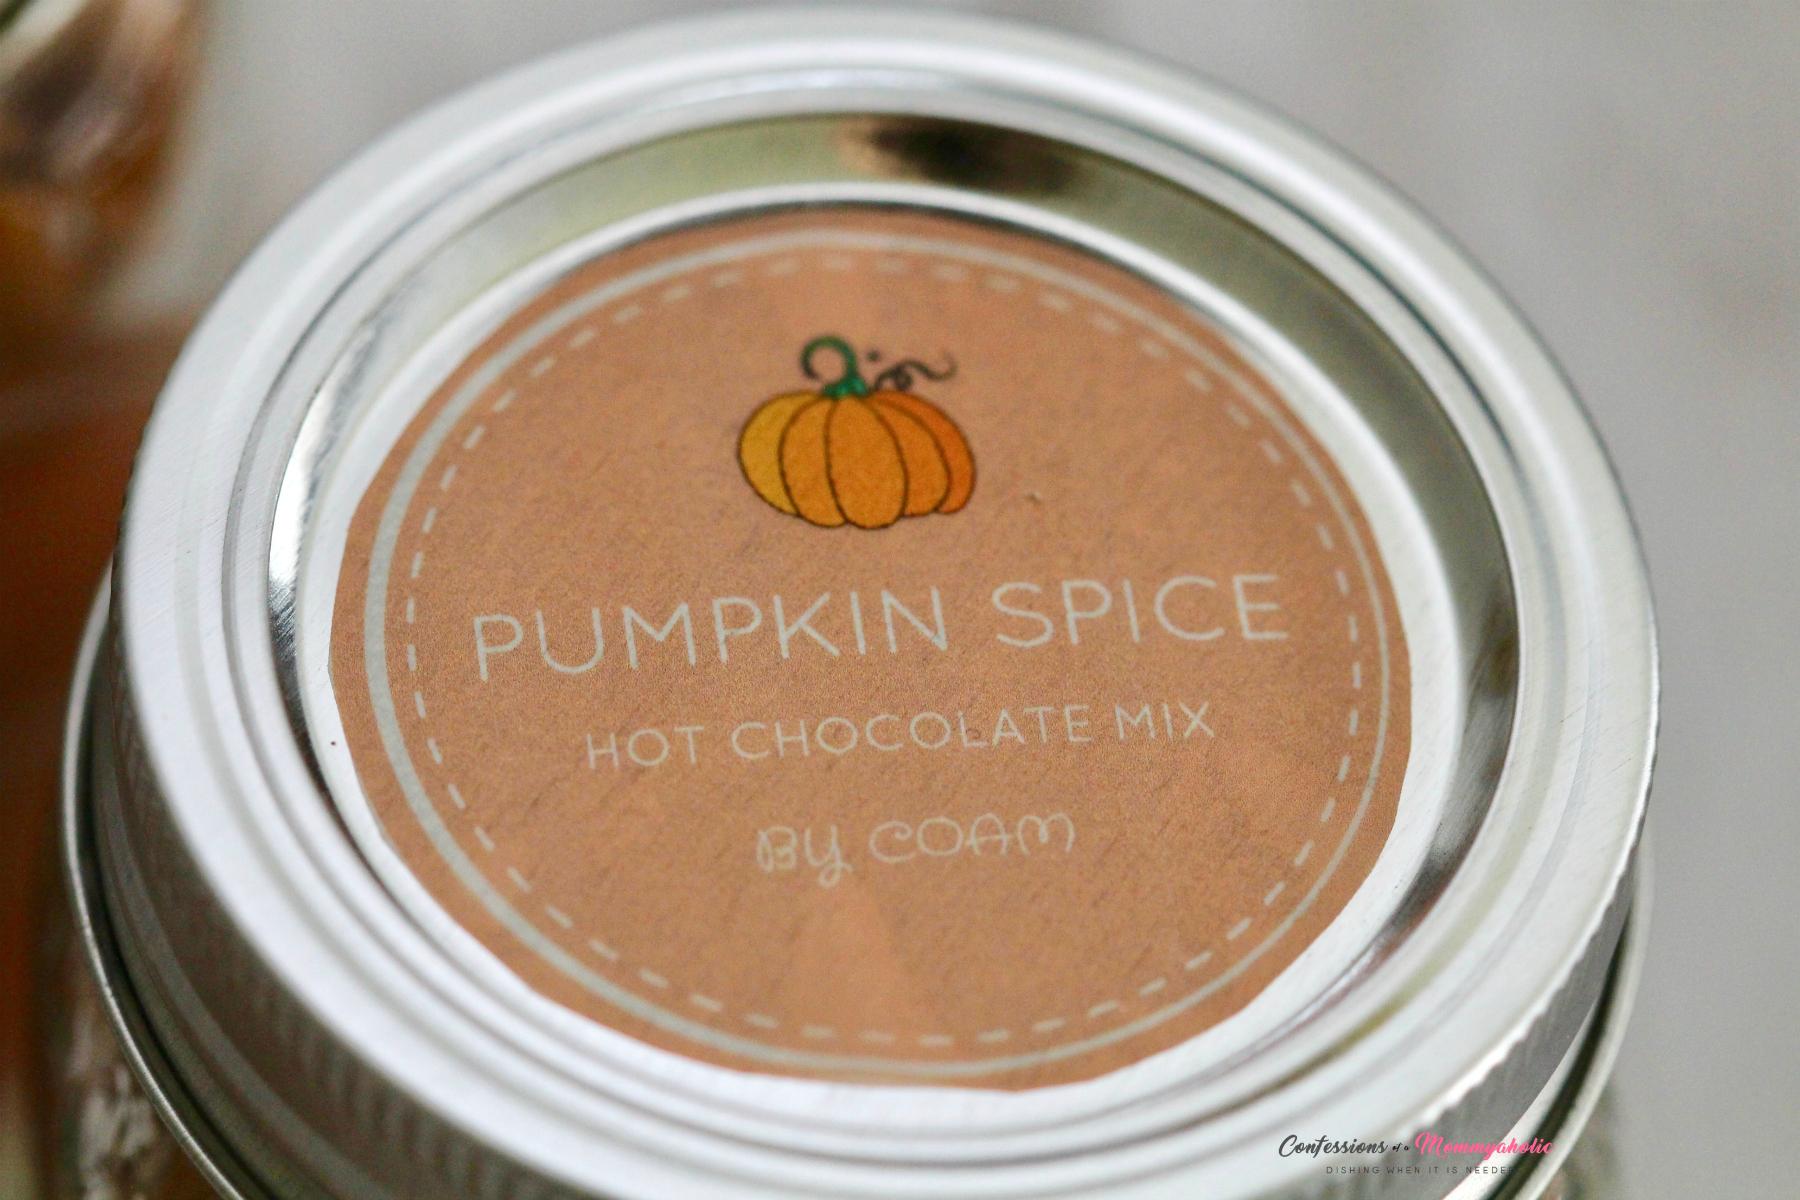 Pumpkin Spice Hot Chocolate Mix Top Label on Mason Jar